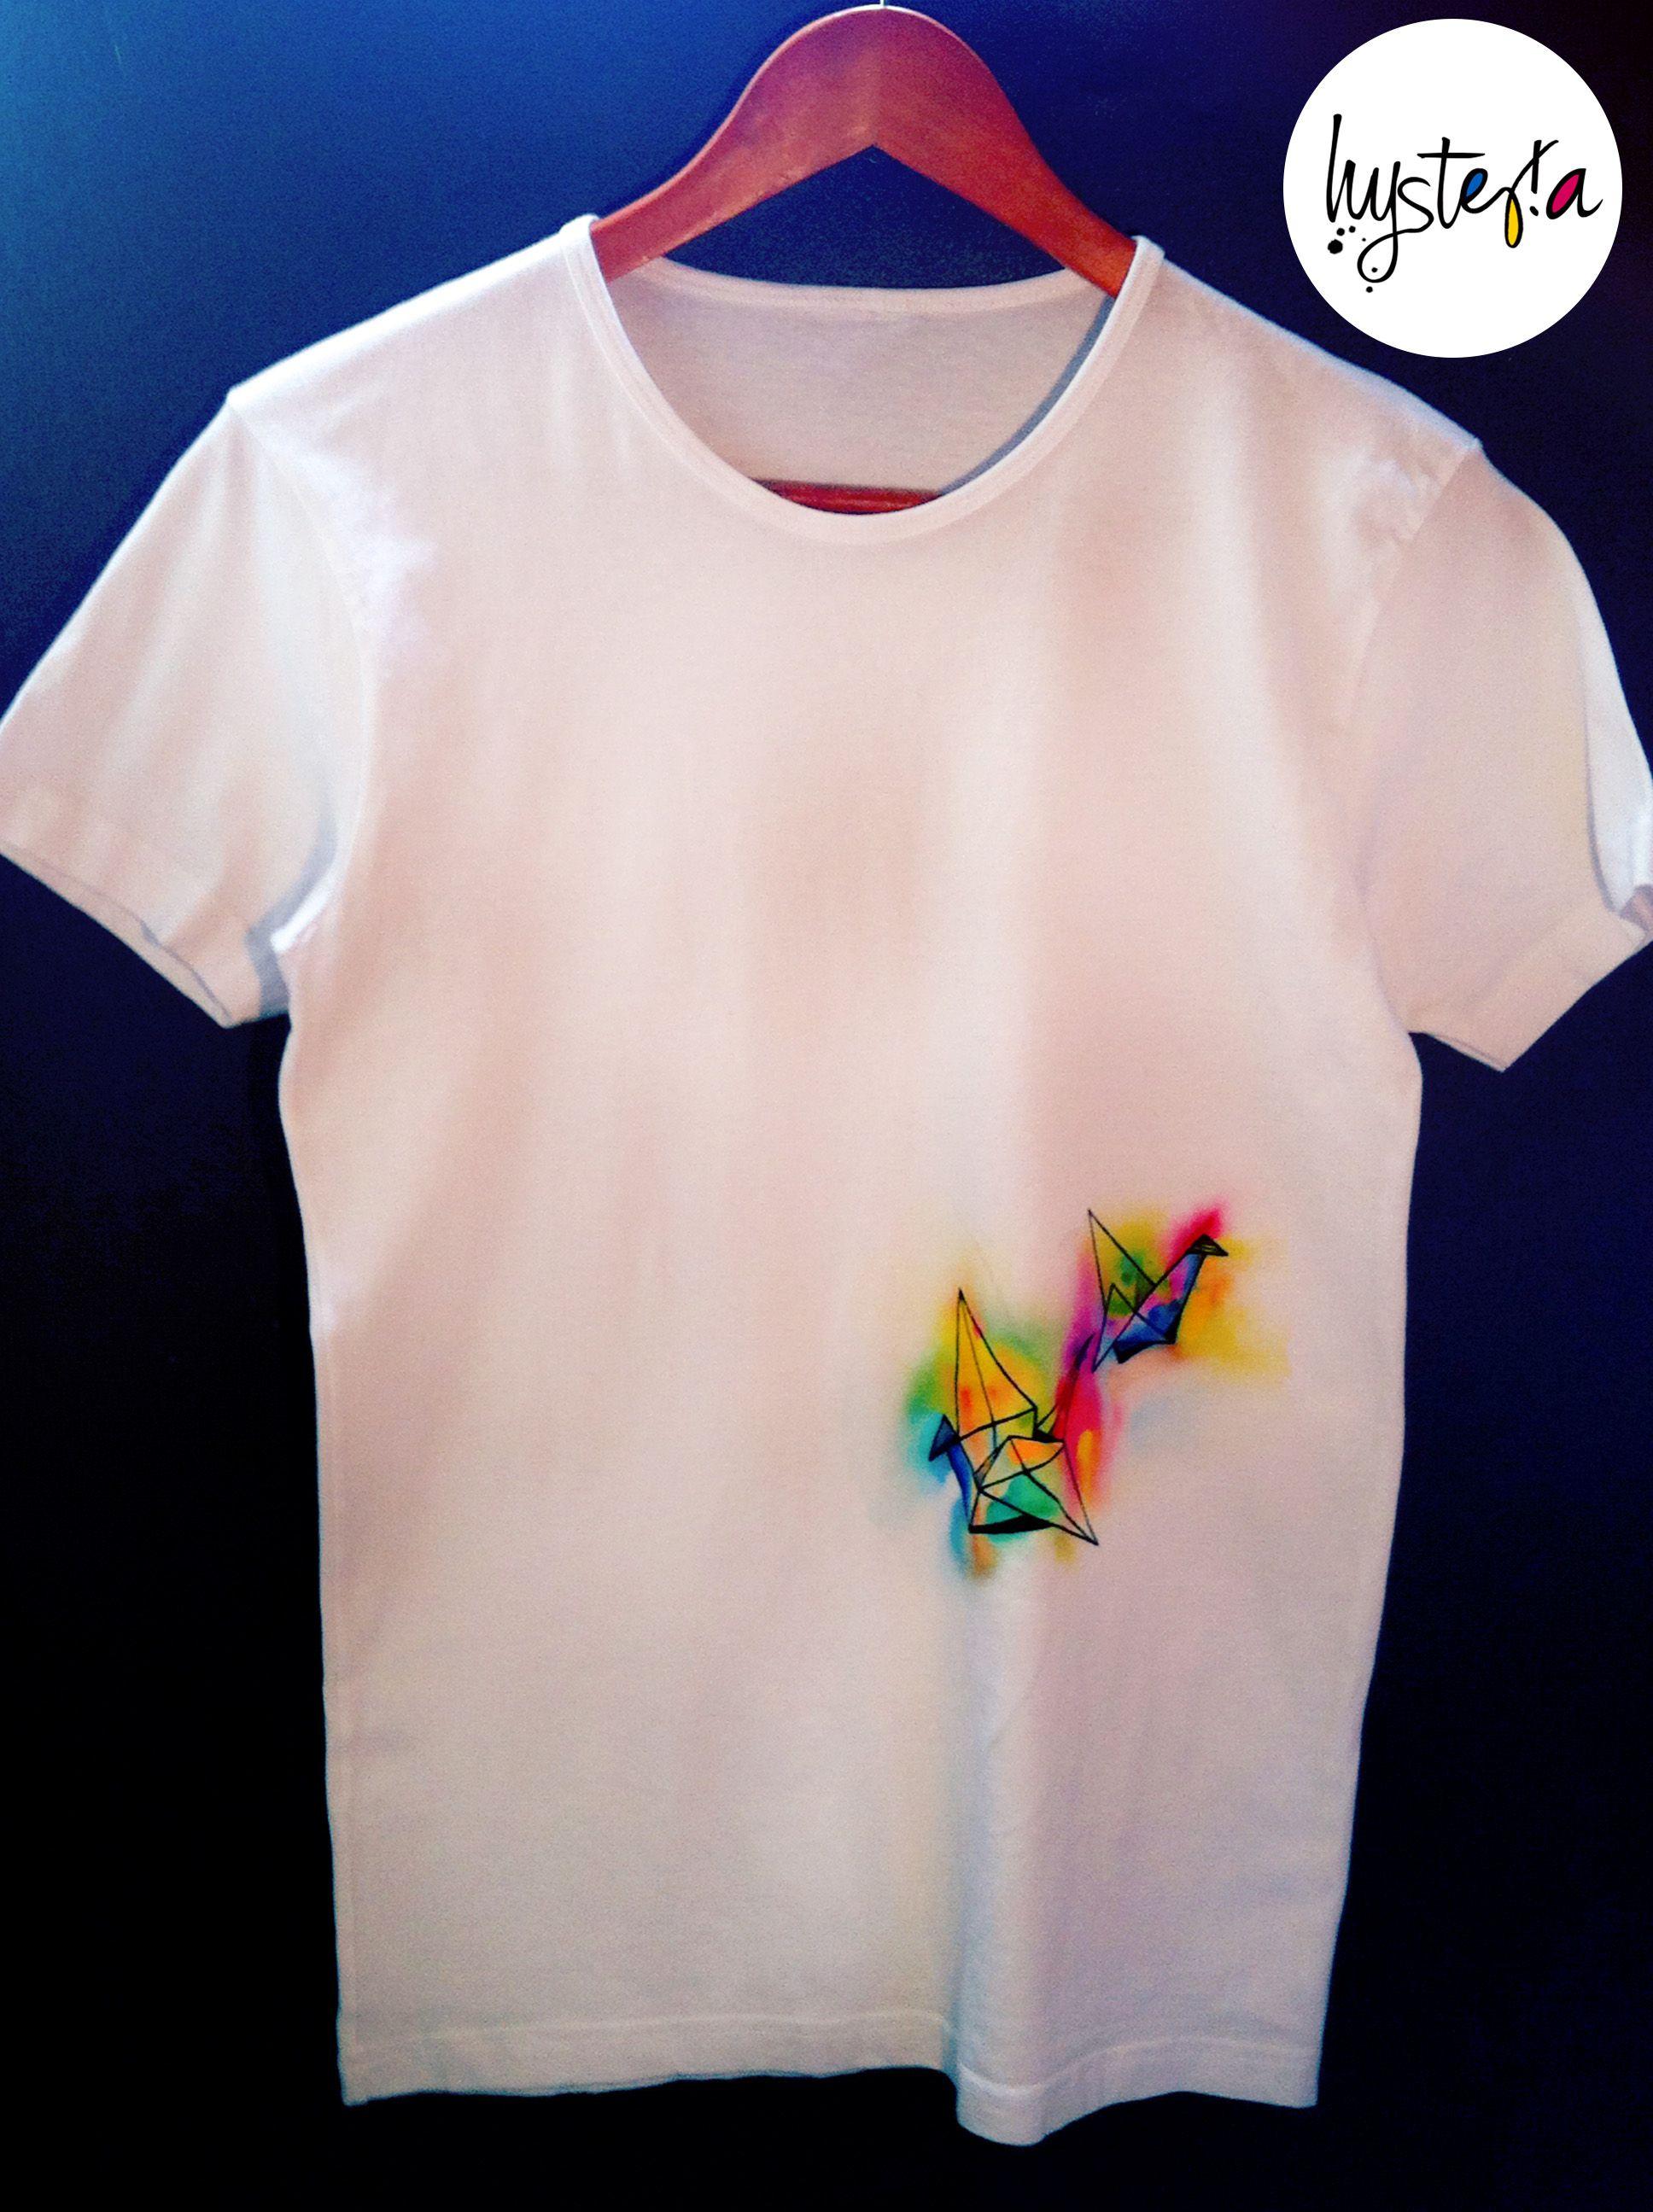 T-shirt design handmade - Fashion